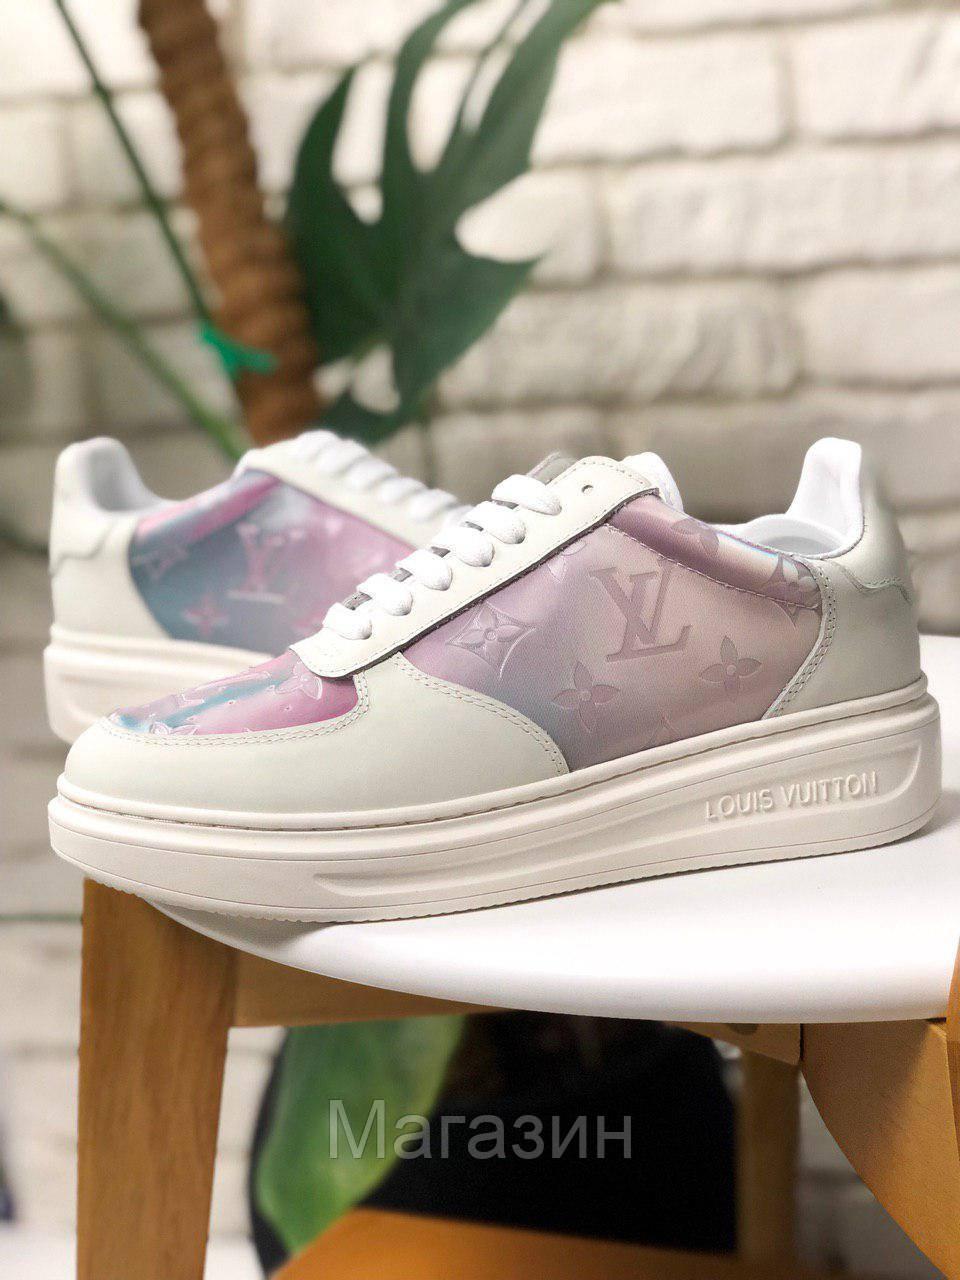 Женские кроссовки Louis Vuitton Sneakers Pink White (кеды Луи Витон) белые